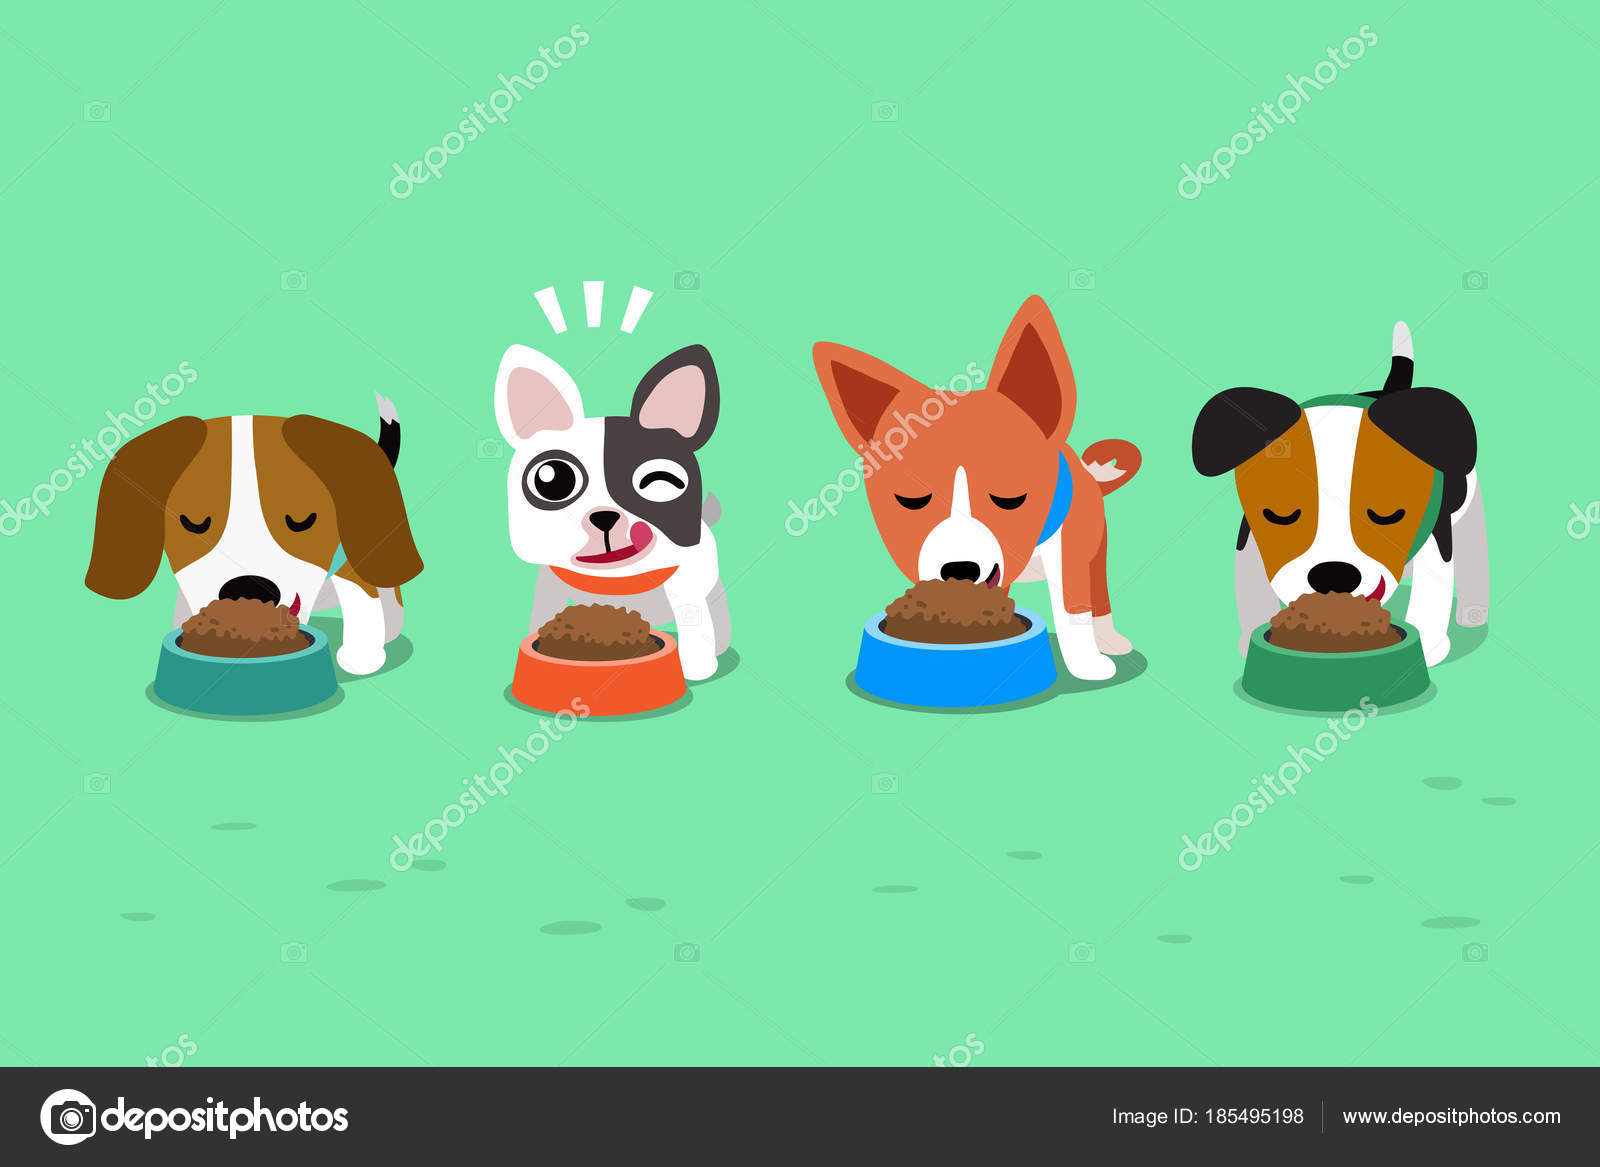 Cartoon Cute Dogs Food Bowls Stock Vector C Jaaak 185495198